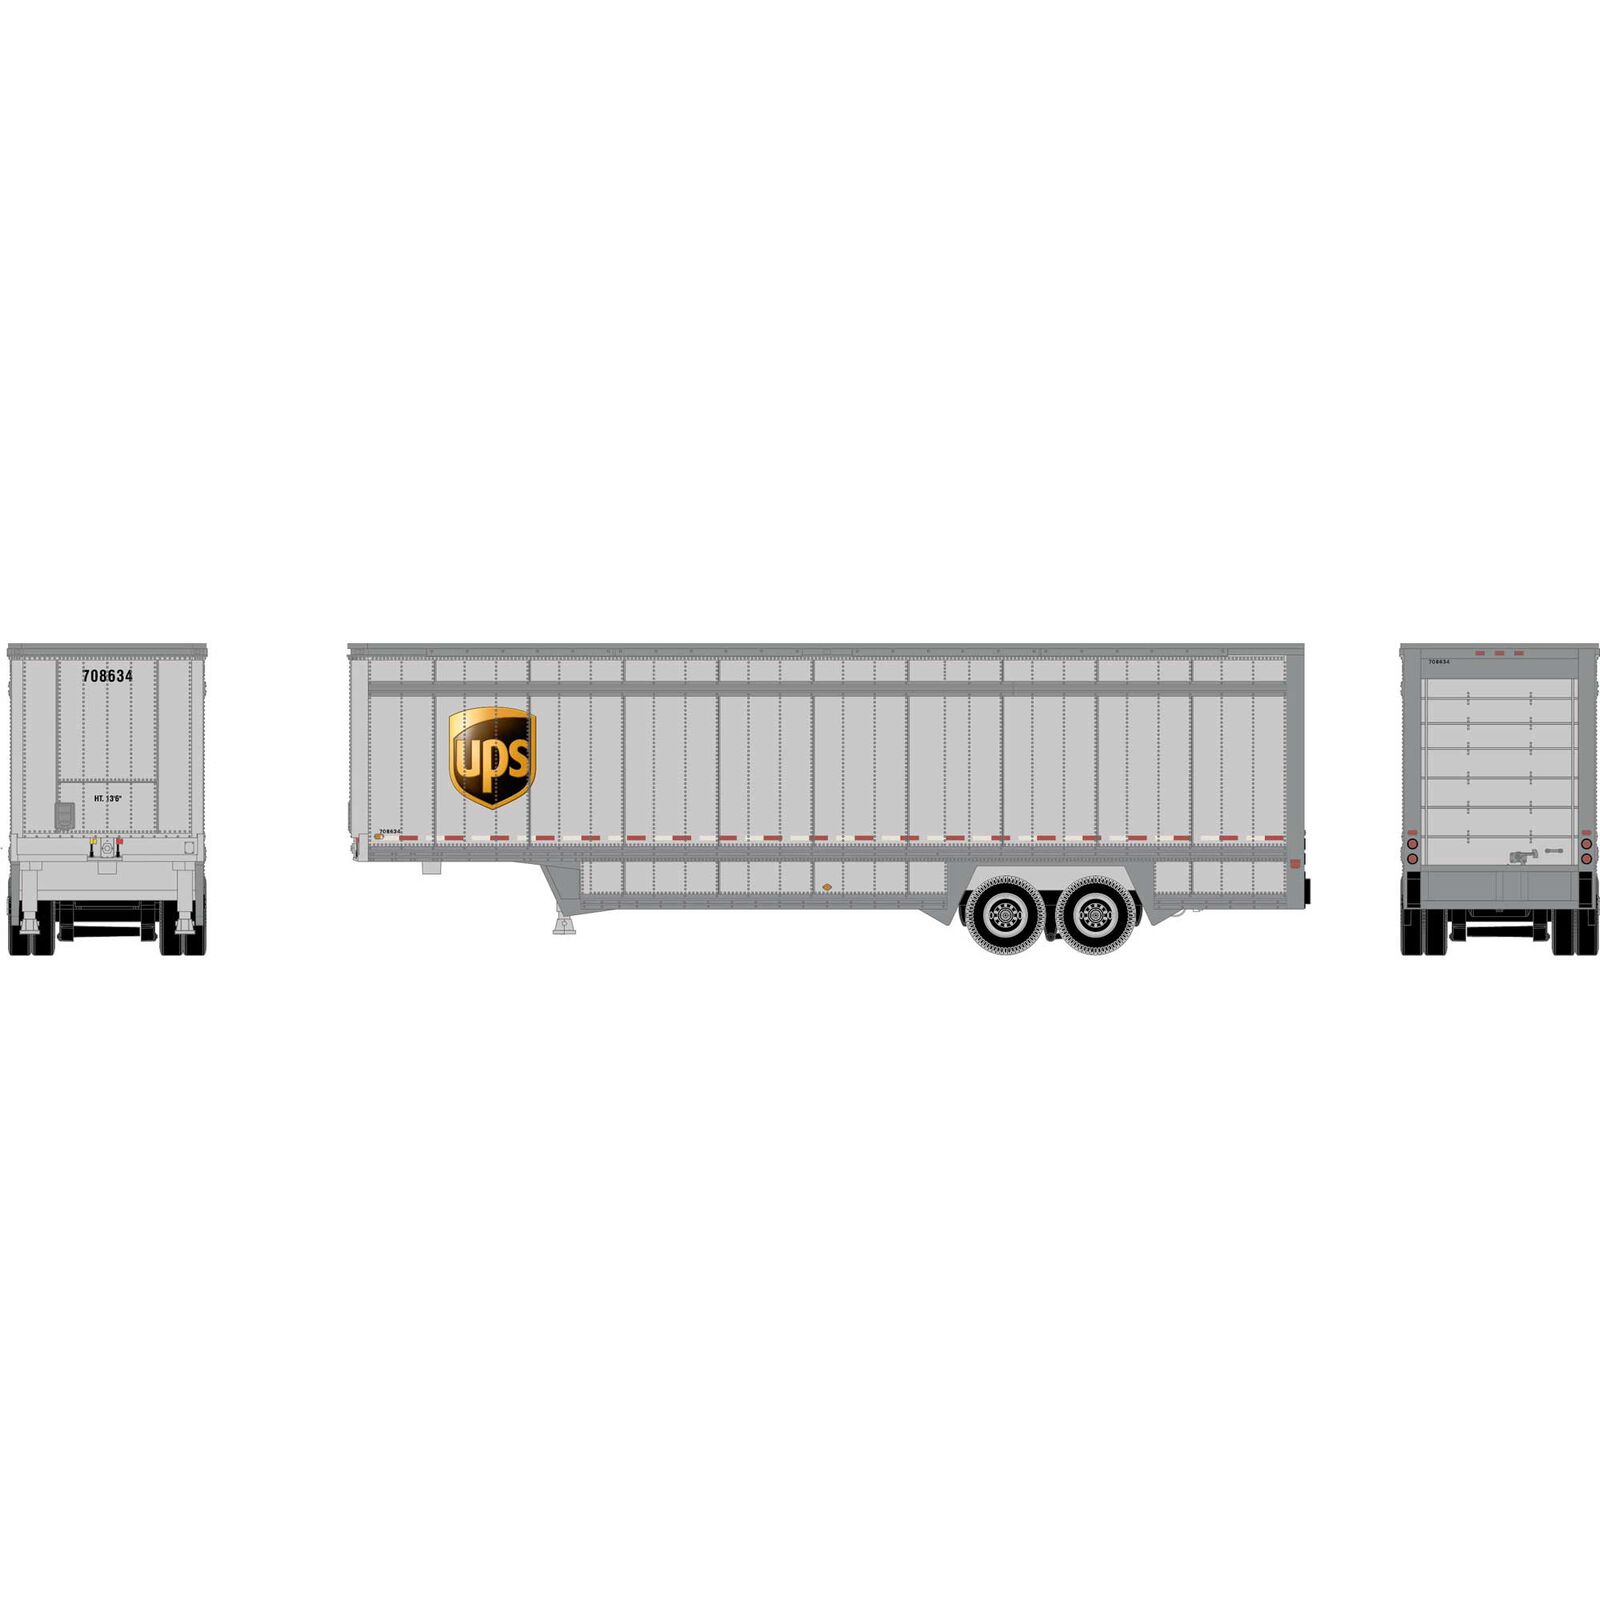 N 40' Drop Sill Parcel Trailer, UPS/Logo #708634